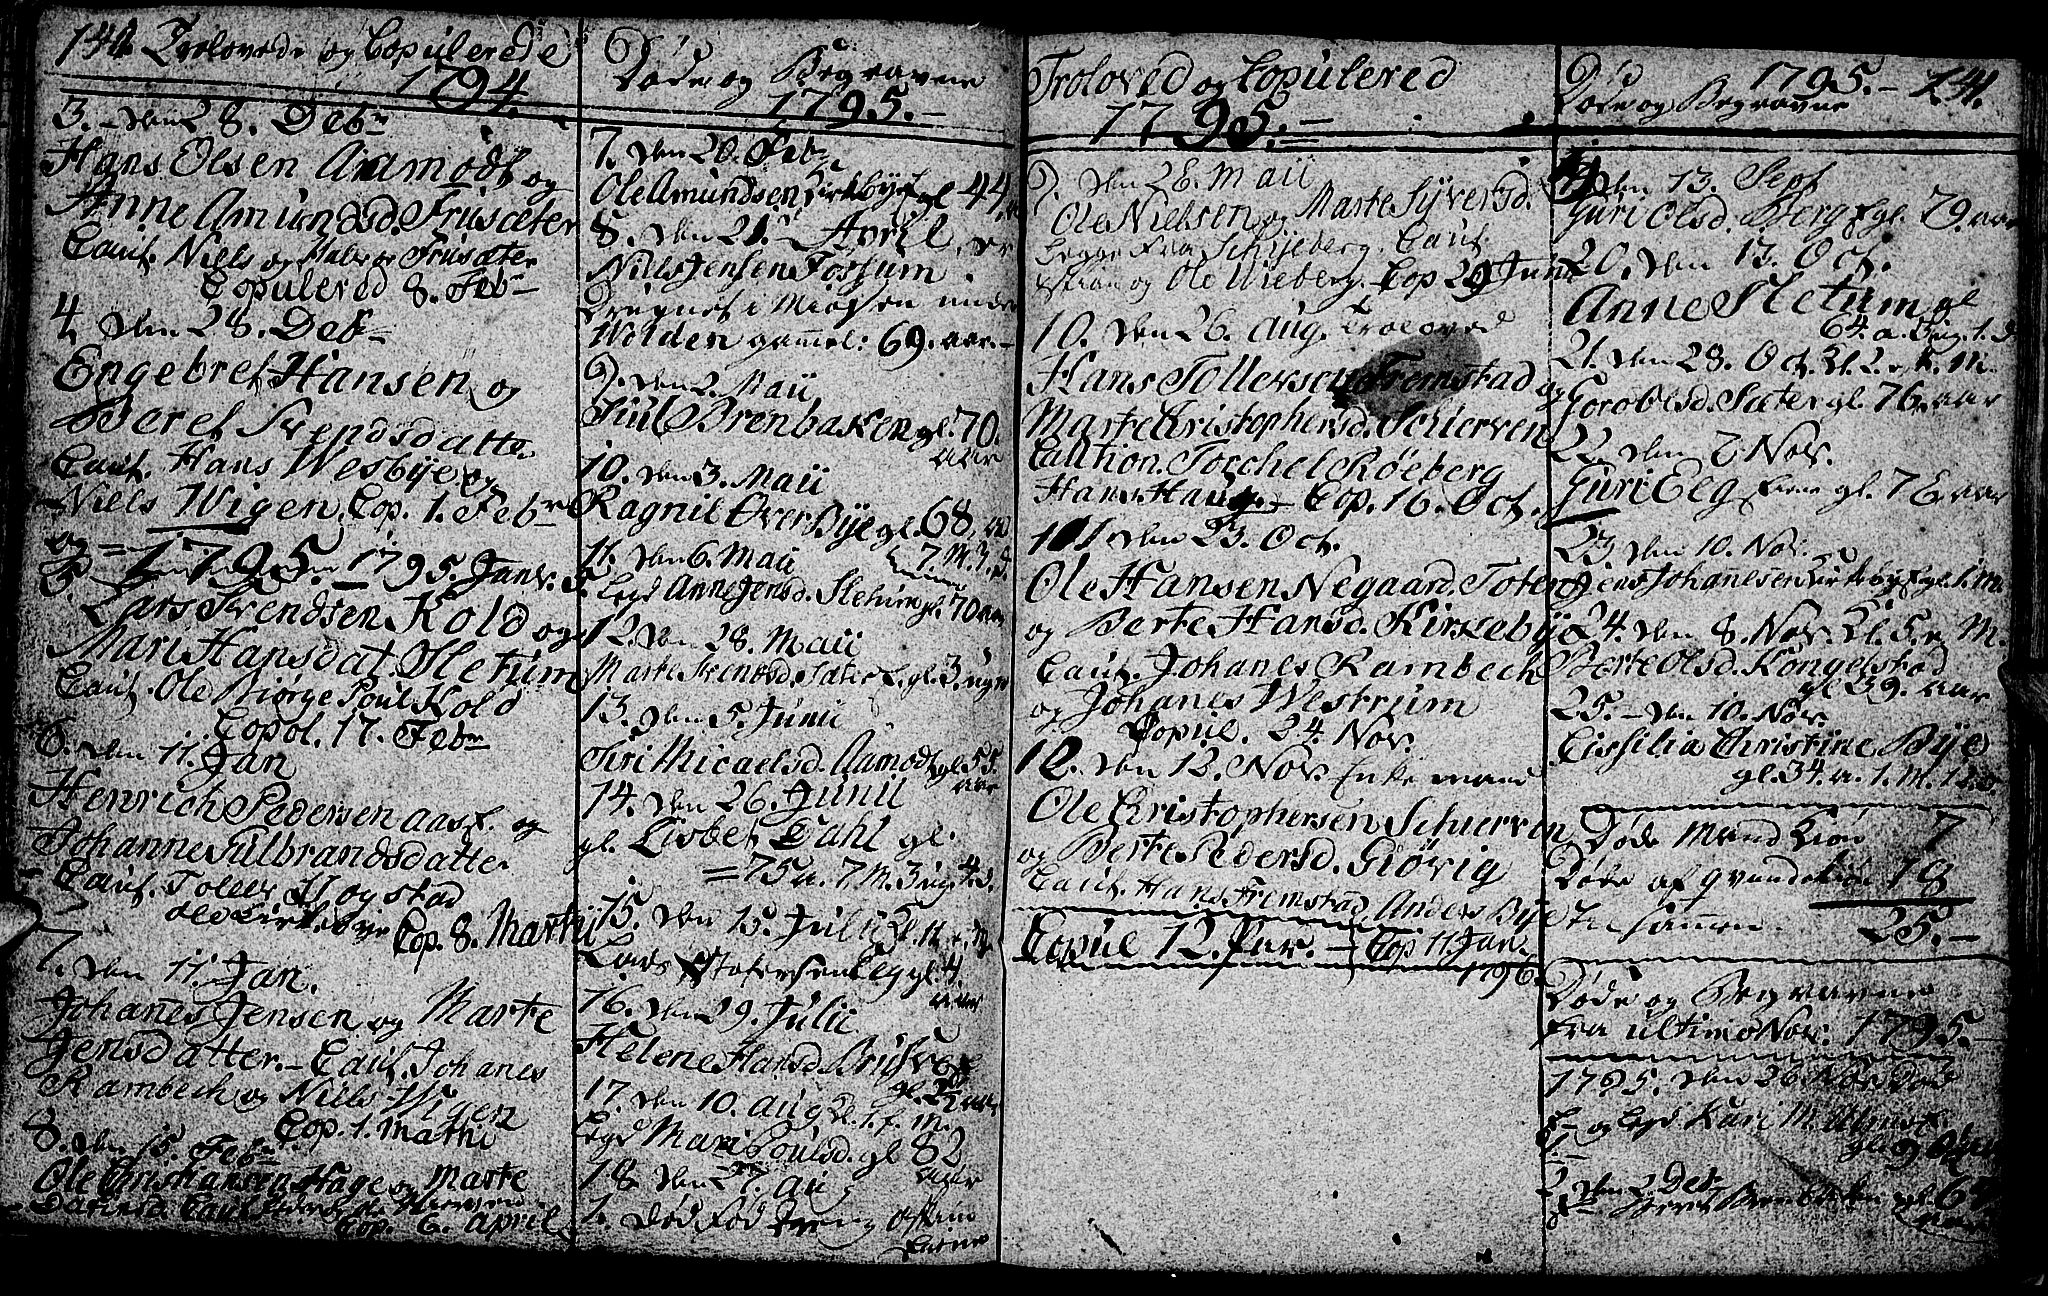 SAH, Vardal prestekontor, H/Ha/Hab/L0002: Klokkerbok nr. 2, 1790-1803, s. 140-141